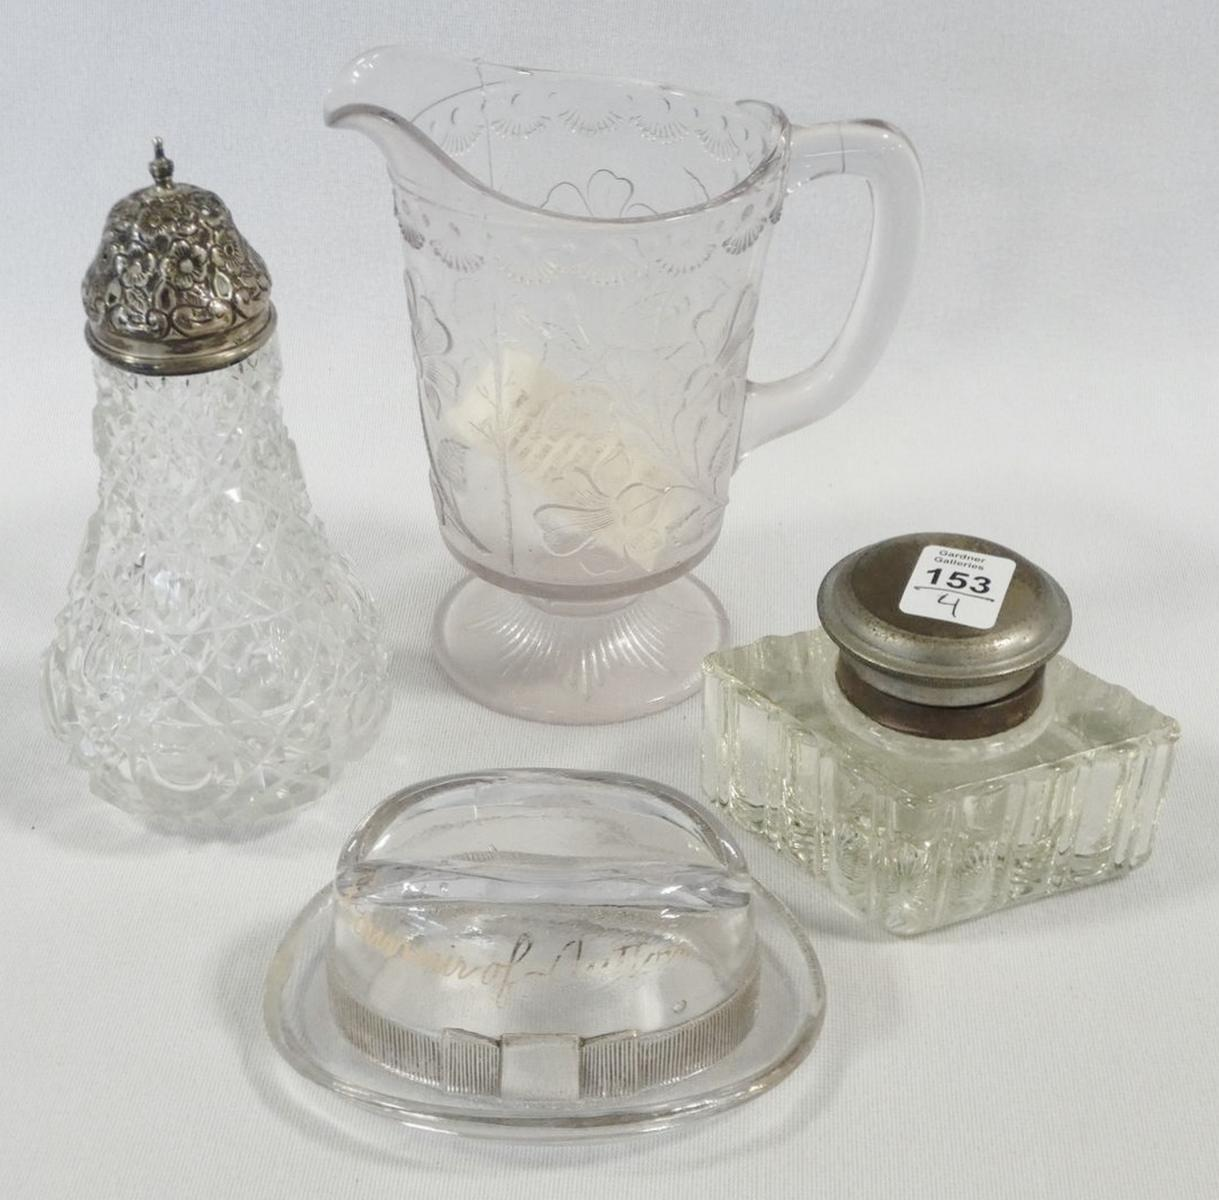 FOUR PIECES OF ANTIQUE GLASS